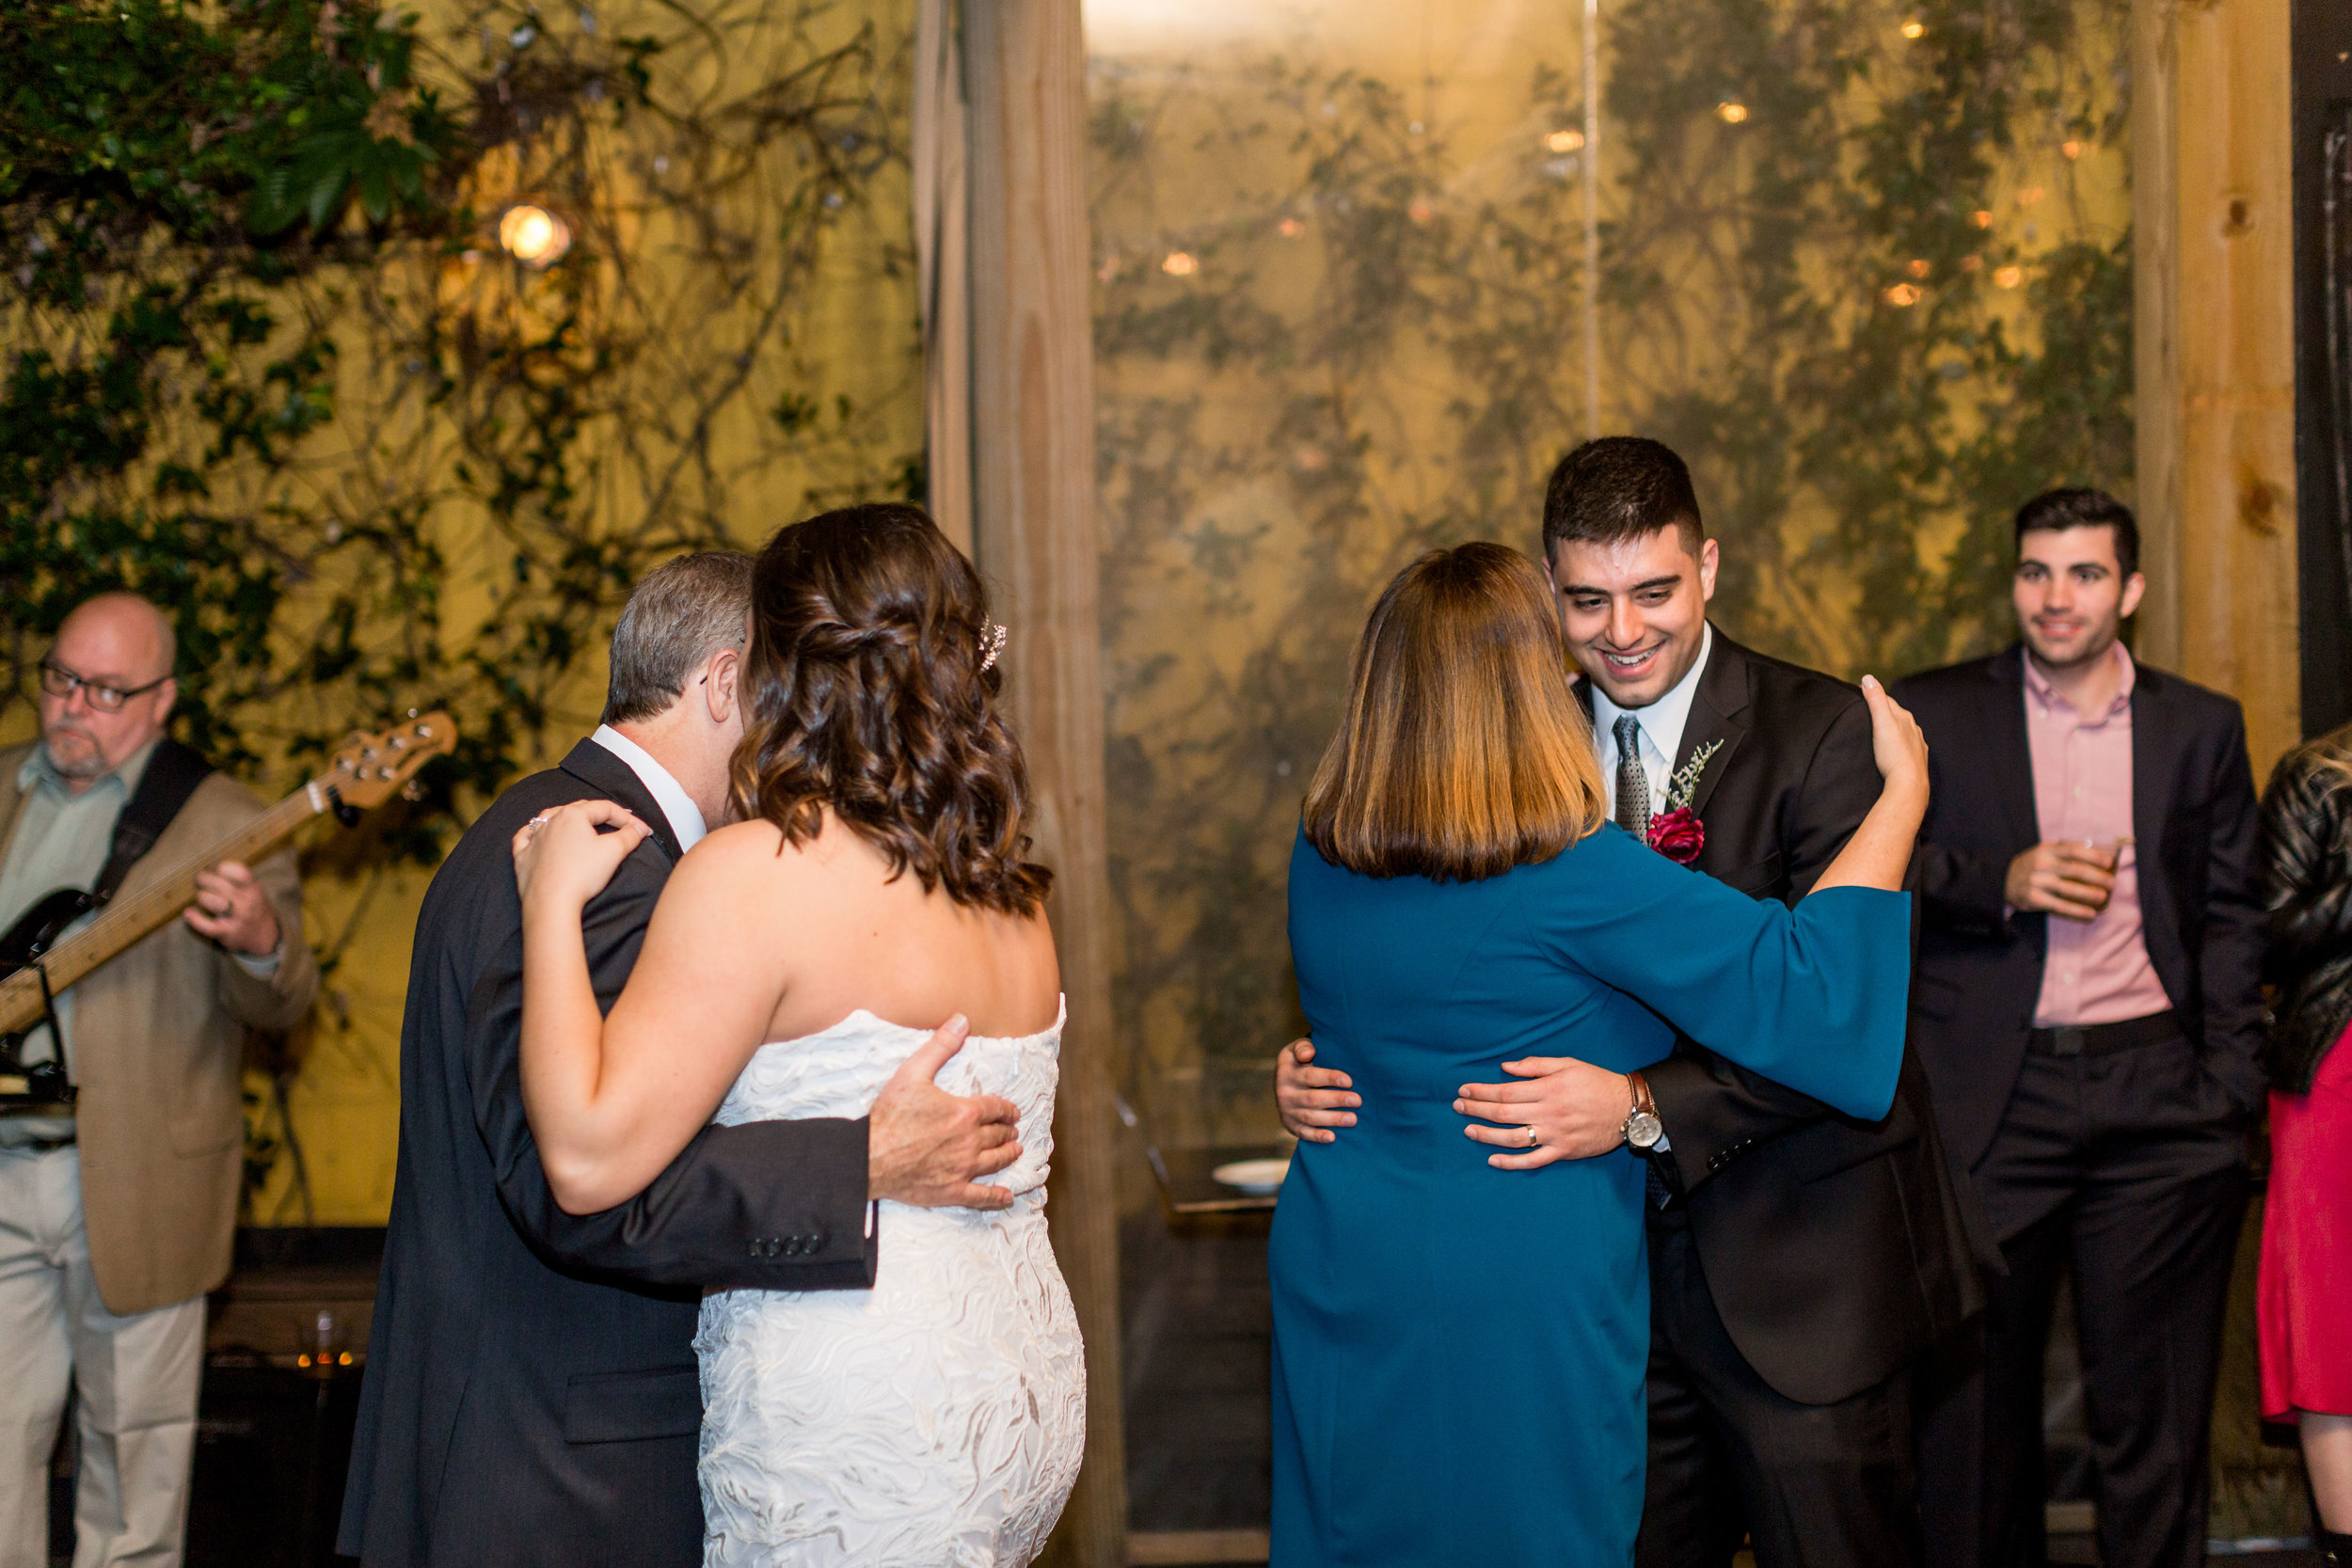 charleston new years elopement popup surprise wedding at upstairs at midtown - scarlet plan & design wedding planners (365).jpg